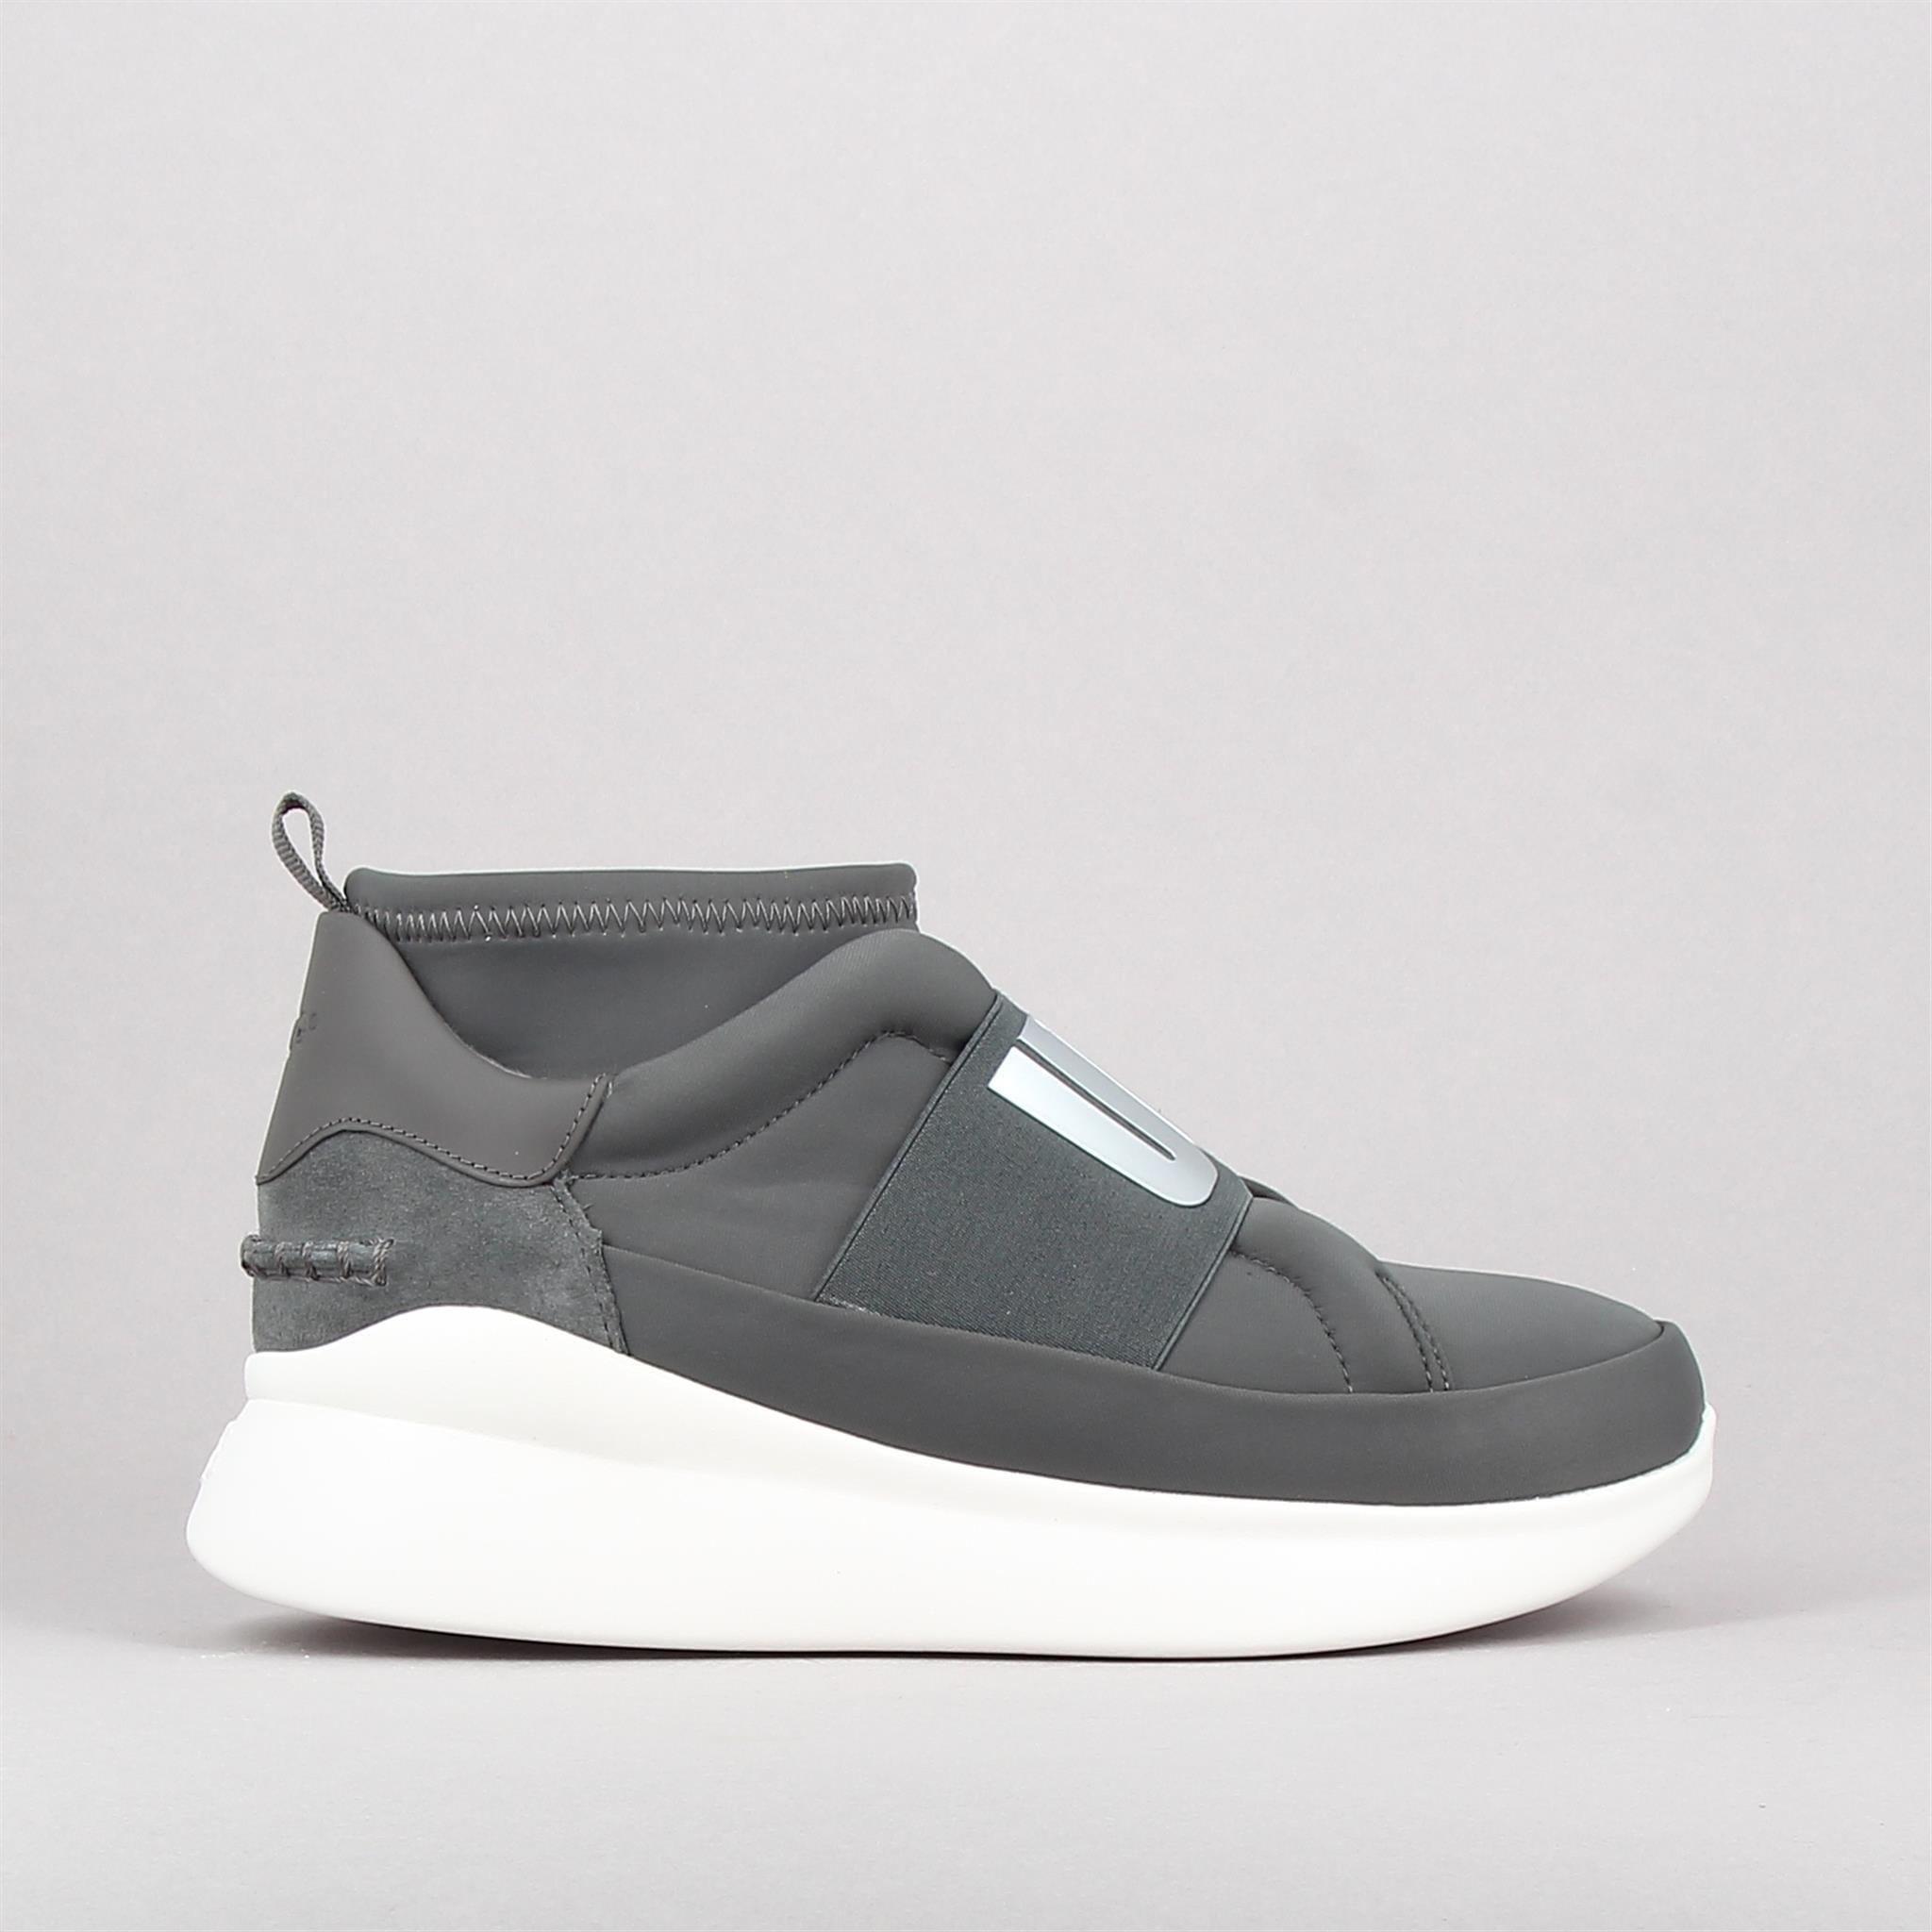 neutra-sneaker-gris-161153026-0.jpg